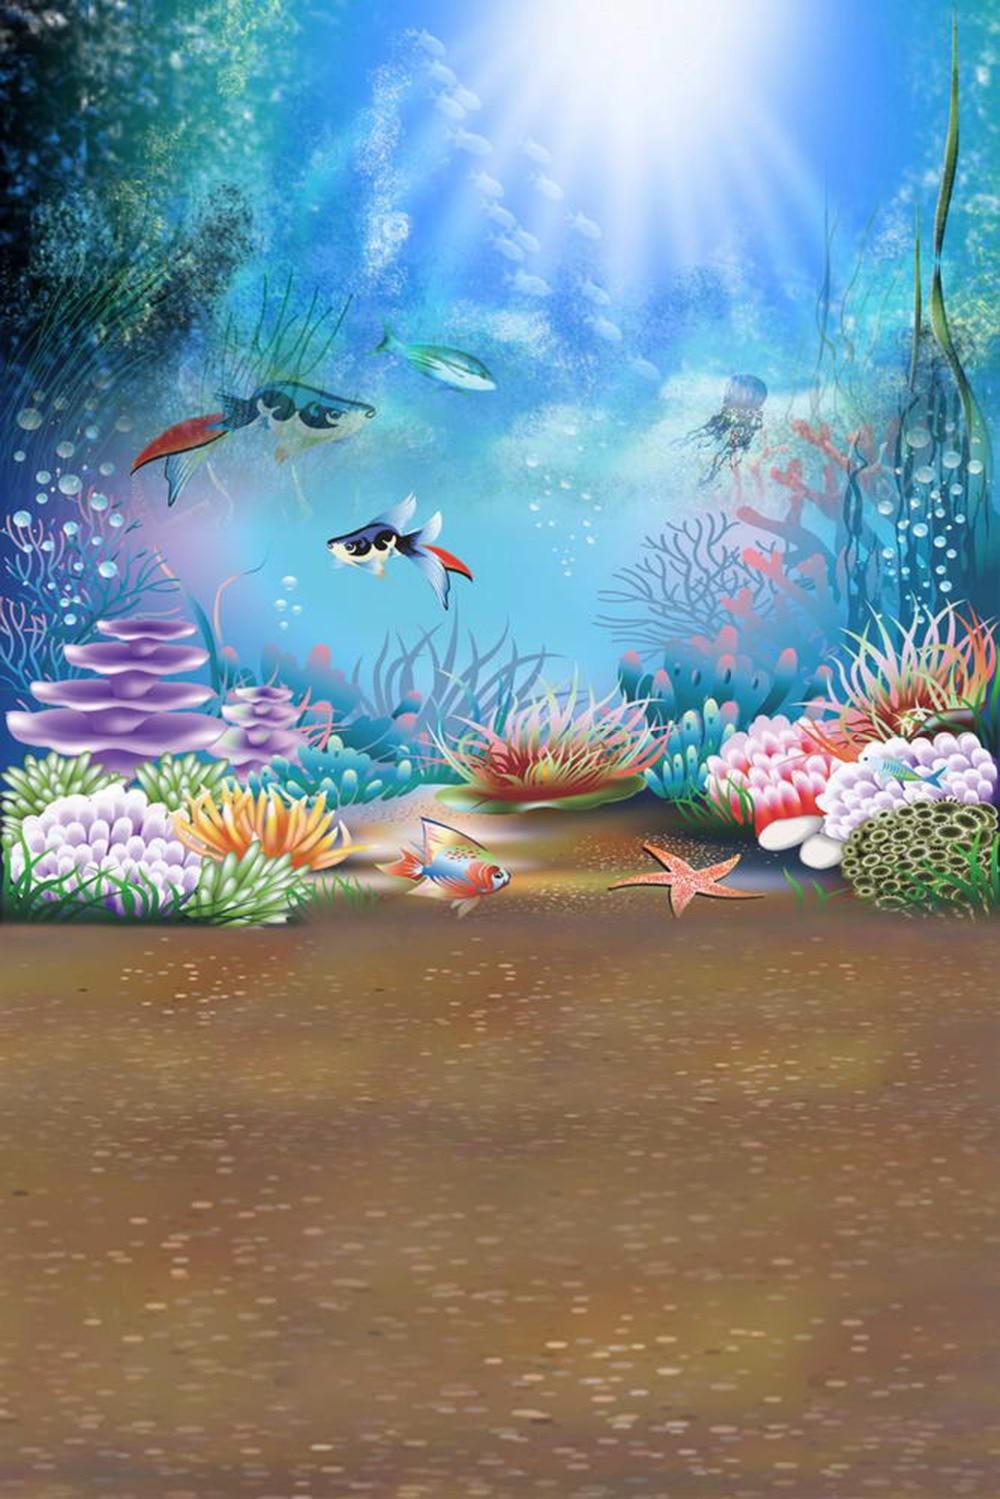 US $15 0 OFF Sinar Matahari Melalui Biru Laut Latar Belakang Untuk Fotografi Rumput Laut Ikan Di Bawah Laut Bayi Anak Anak Kartun Foto Latar